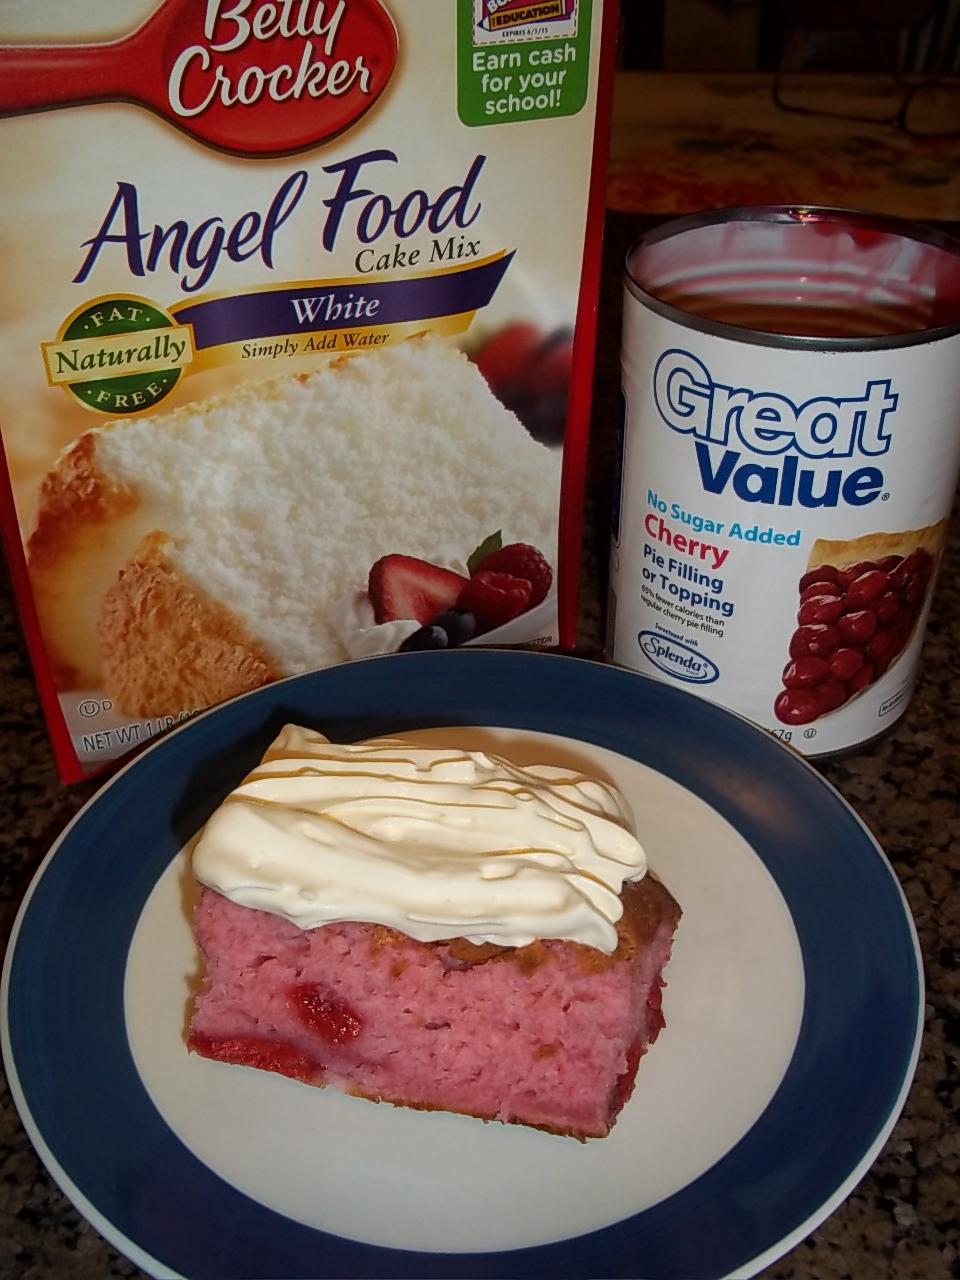 Cherry Flavored Angel Food Cake